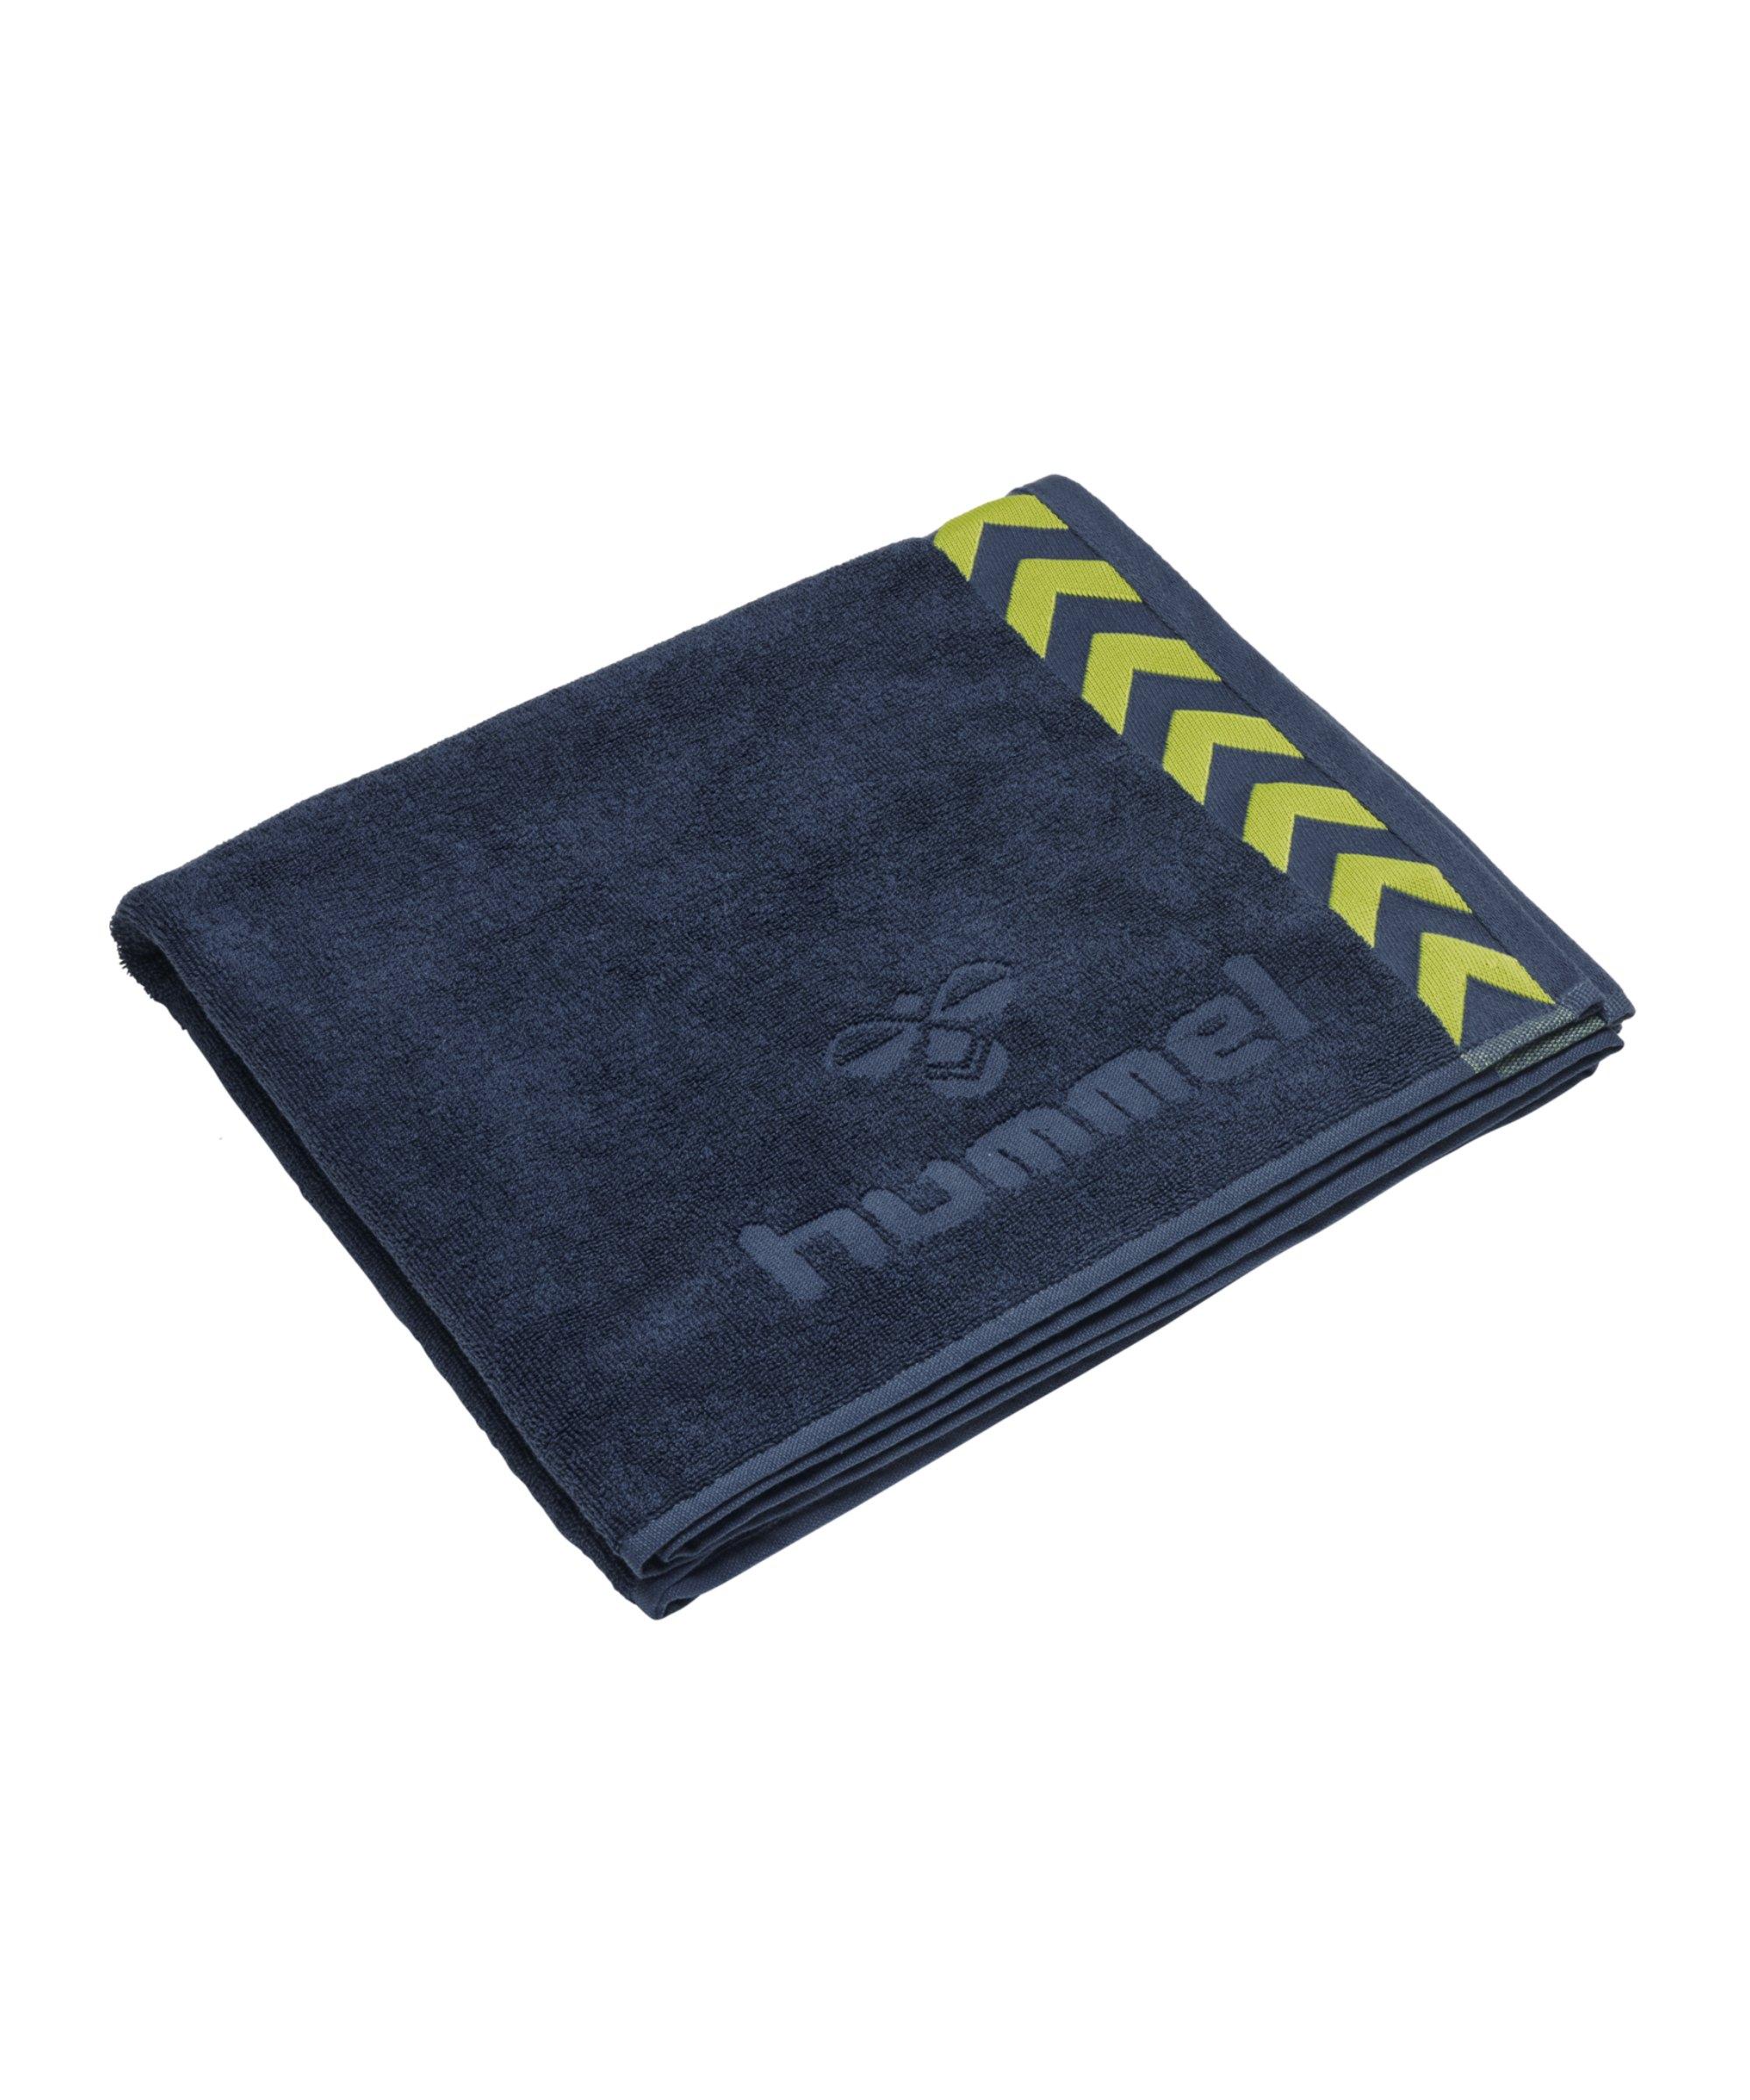 Hummel Large Towel Handtuch Blau F6616 - blau